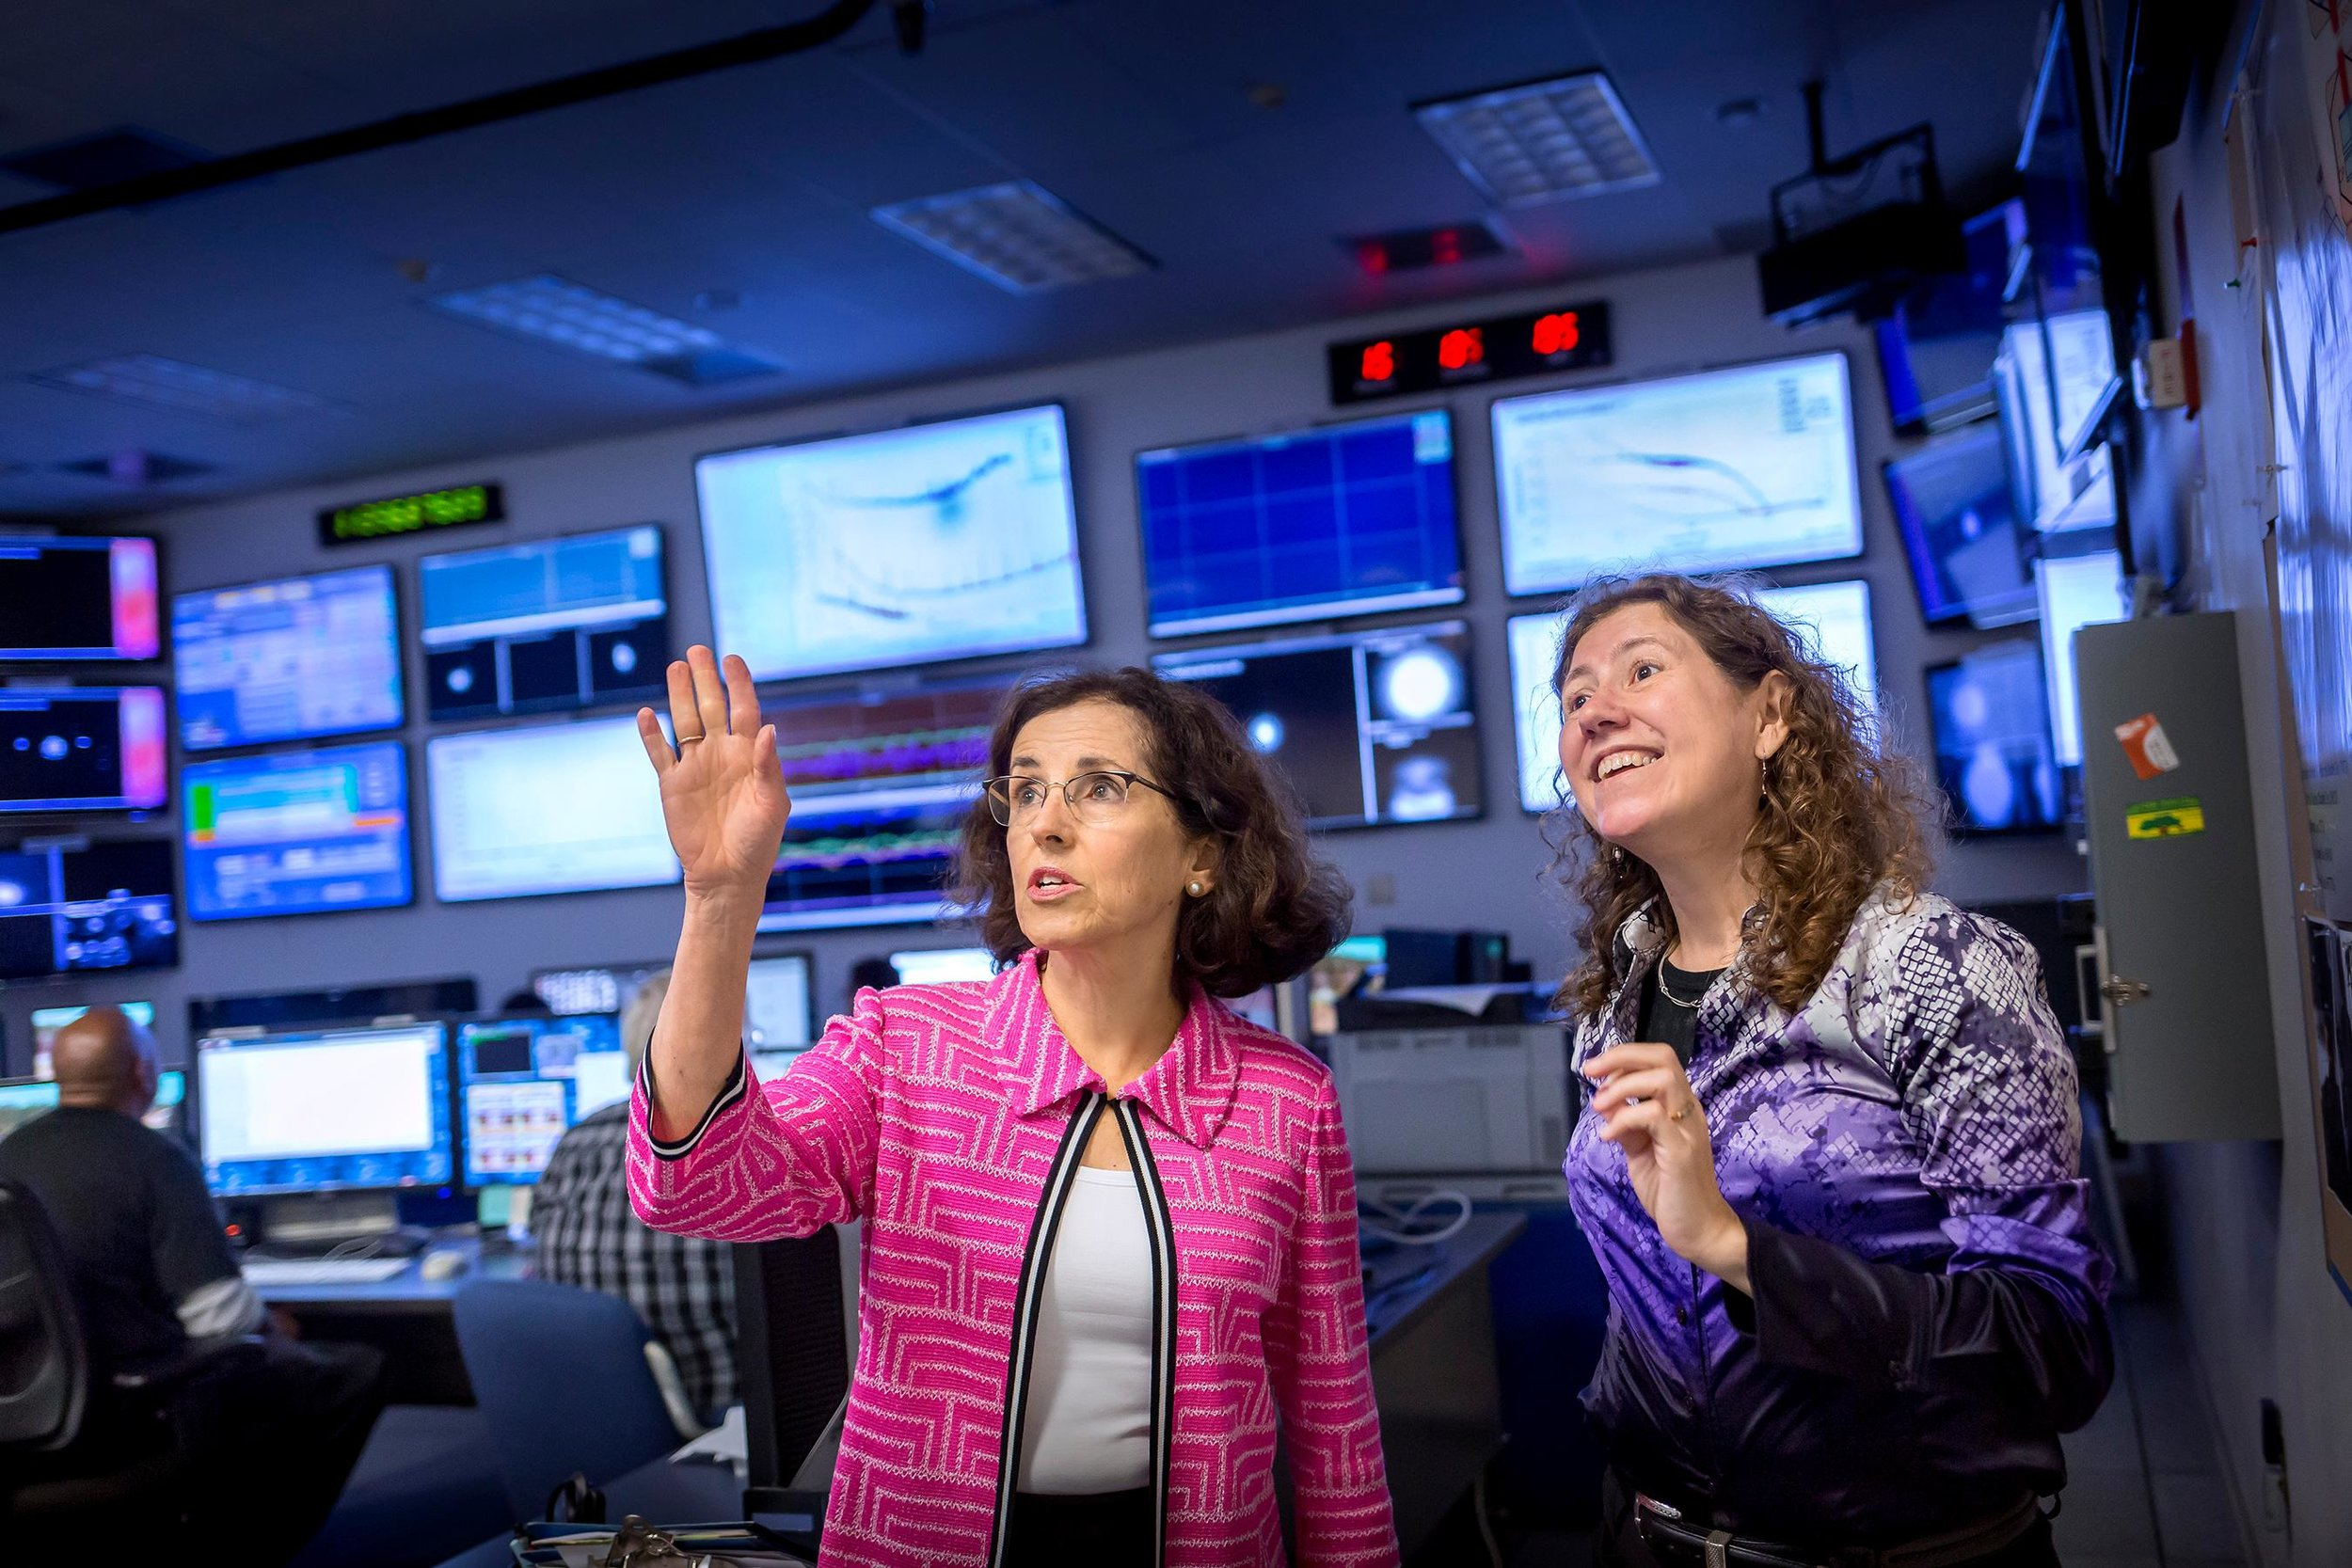 Photo of NSF director France Córdova and Gabriela Gonzalez, former spokesperson for the Laser Interferometer Gravitational-Wave Observatory (LIGO) Scientific Collaboration, at the LIGO facility in Livingston, Louisiana. Credit: Eduardo M. Perez/Louisiana State University